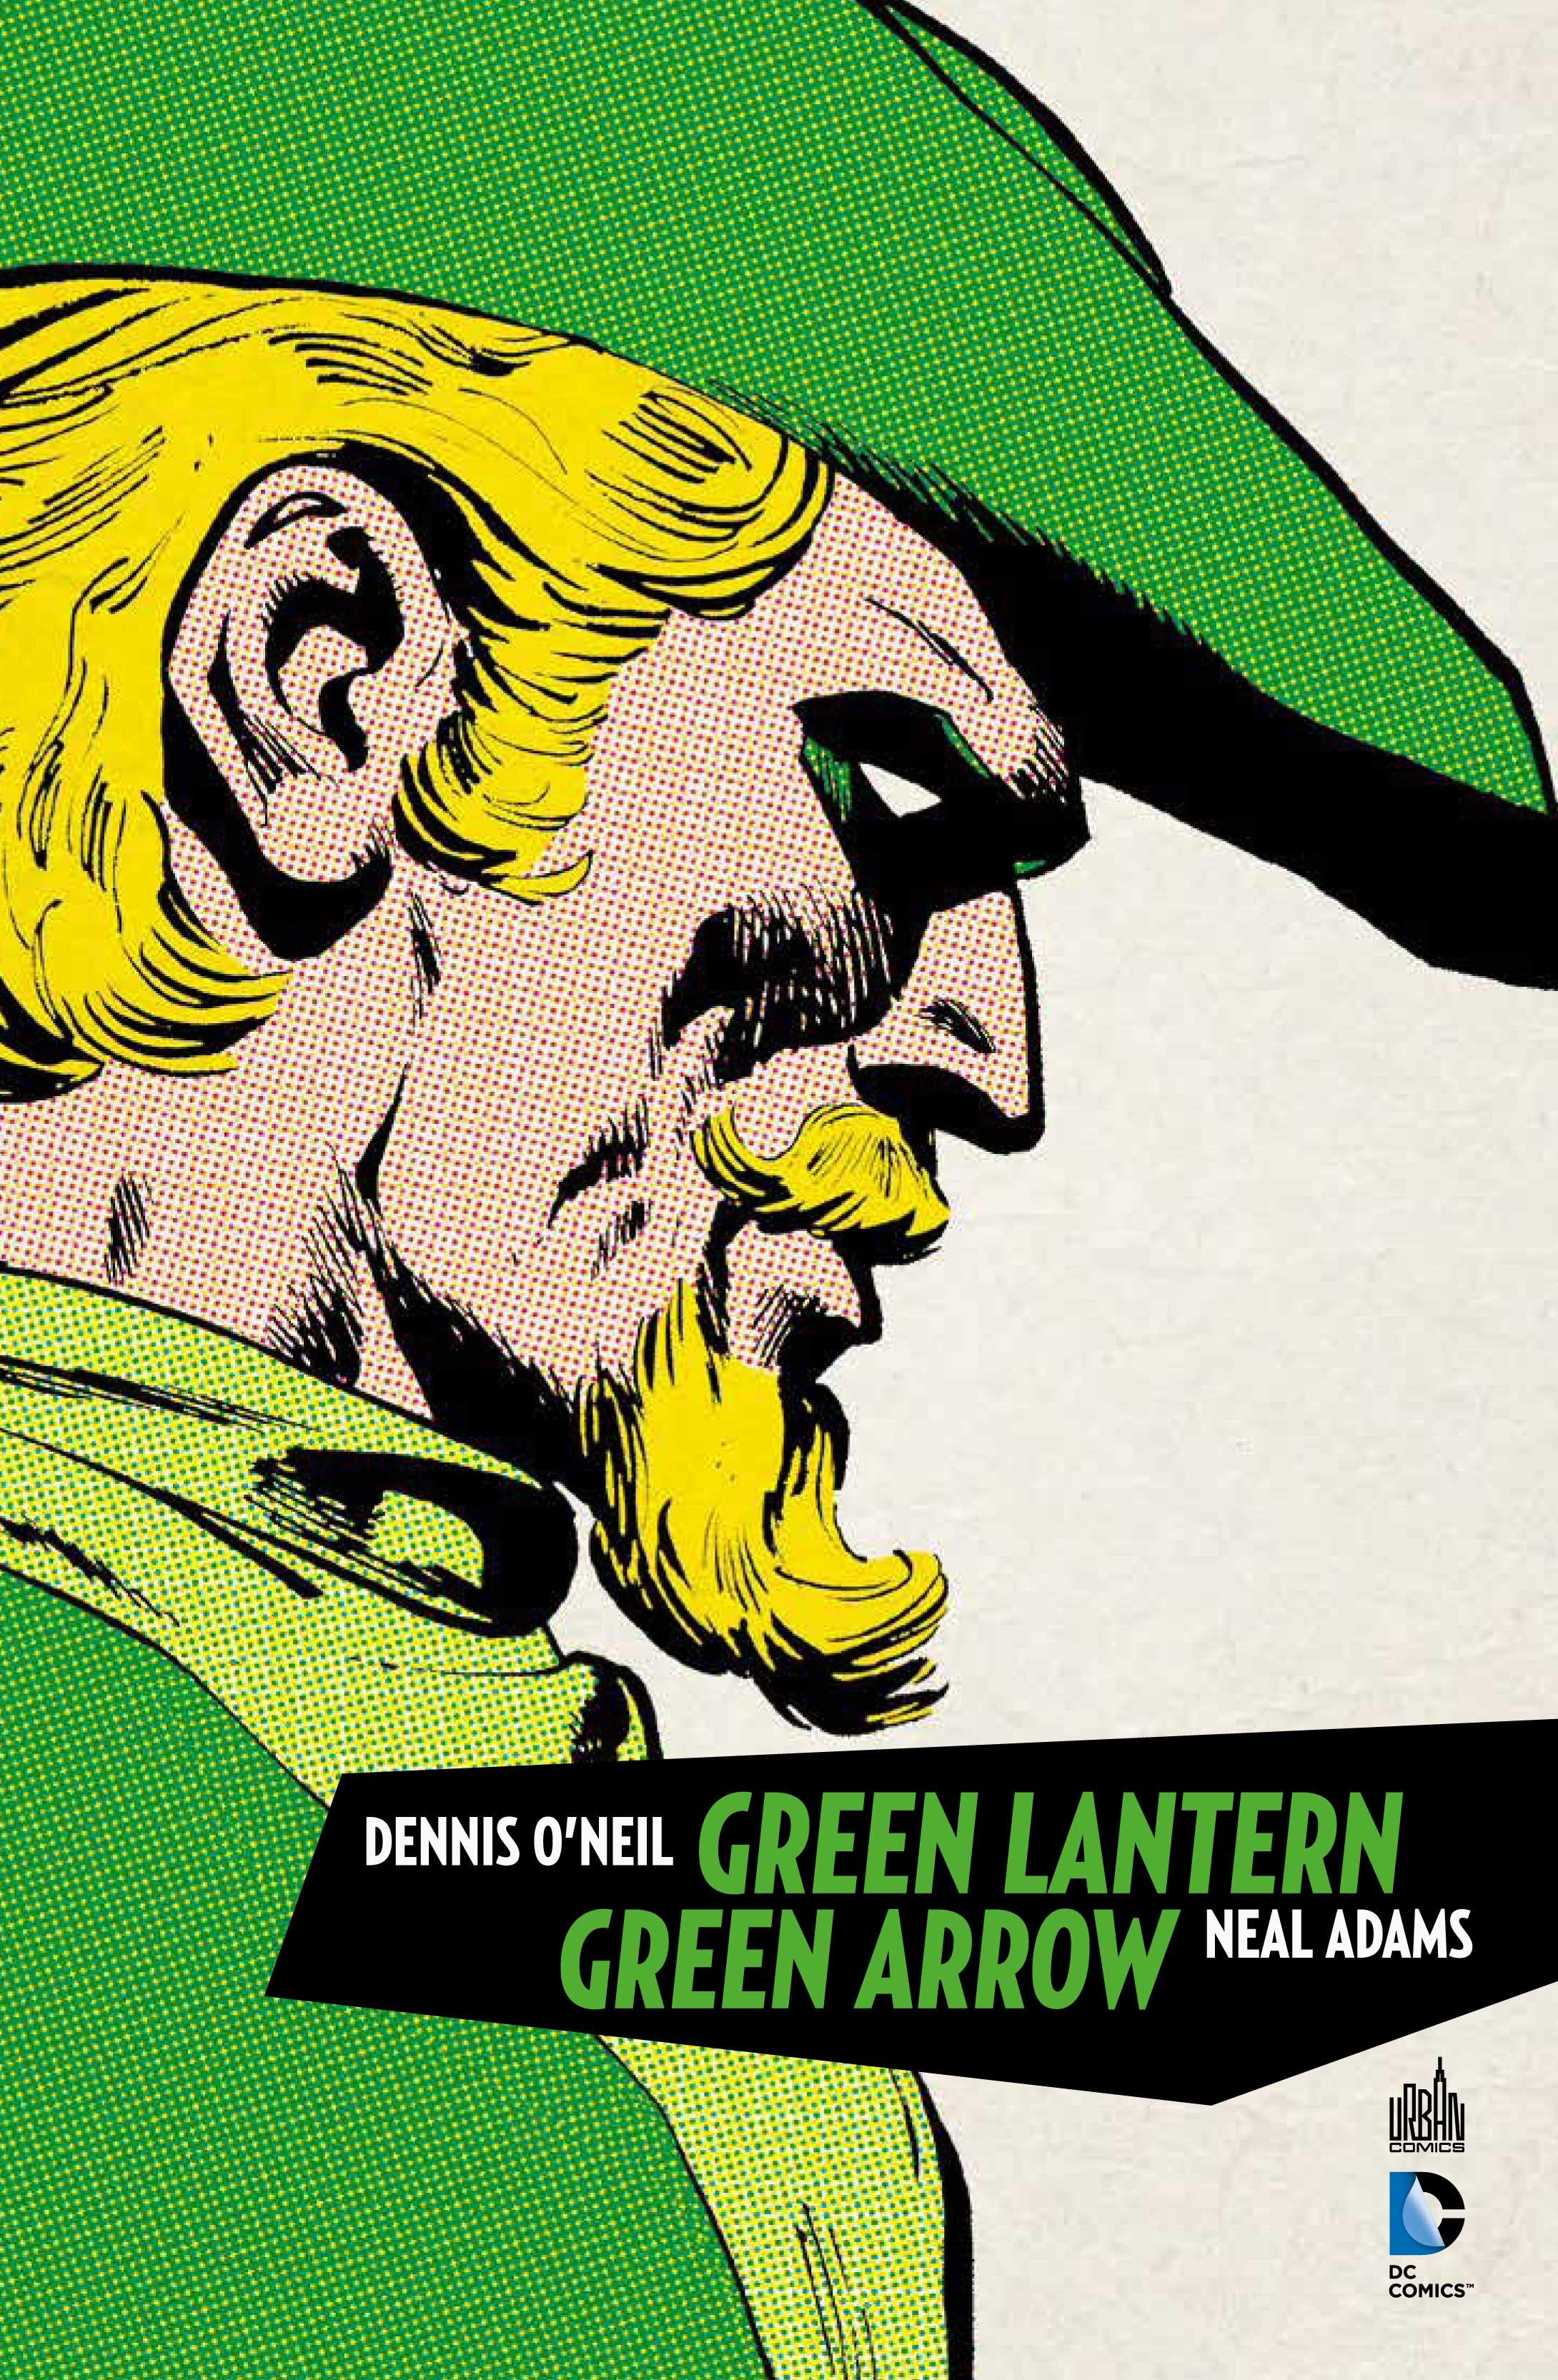 Critique de Green Lantern Green Arrow - Dennis O Neil et Neal Adams